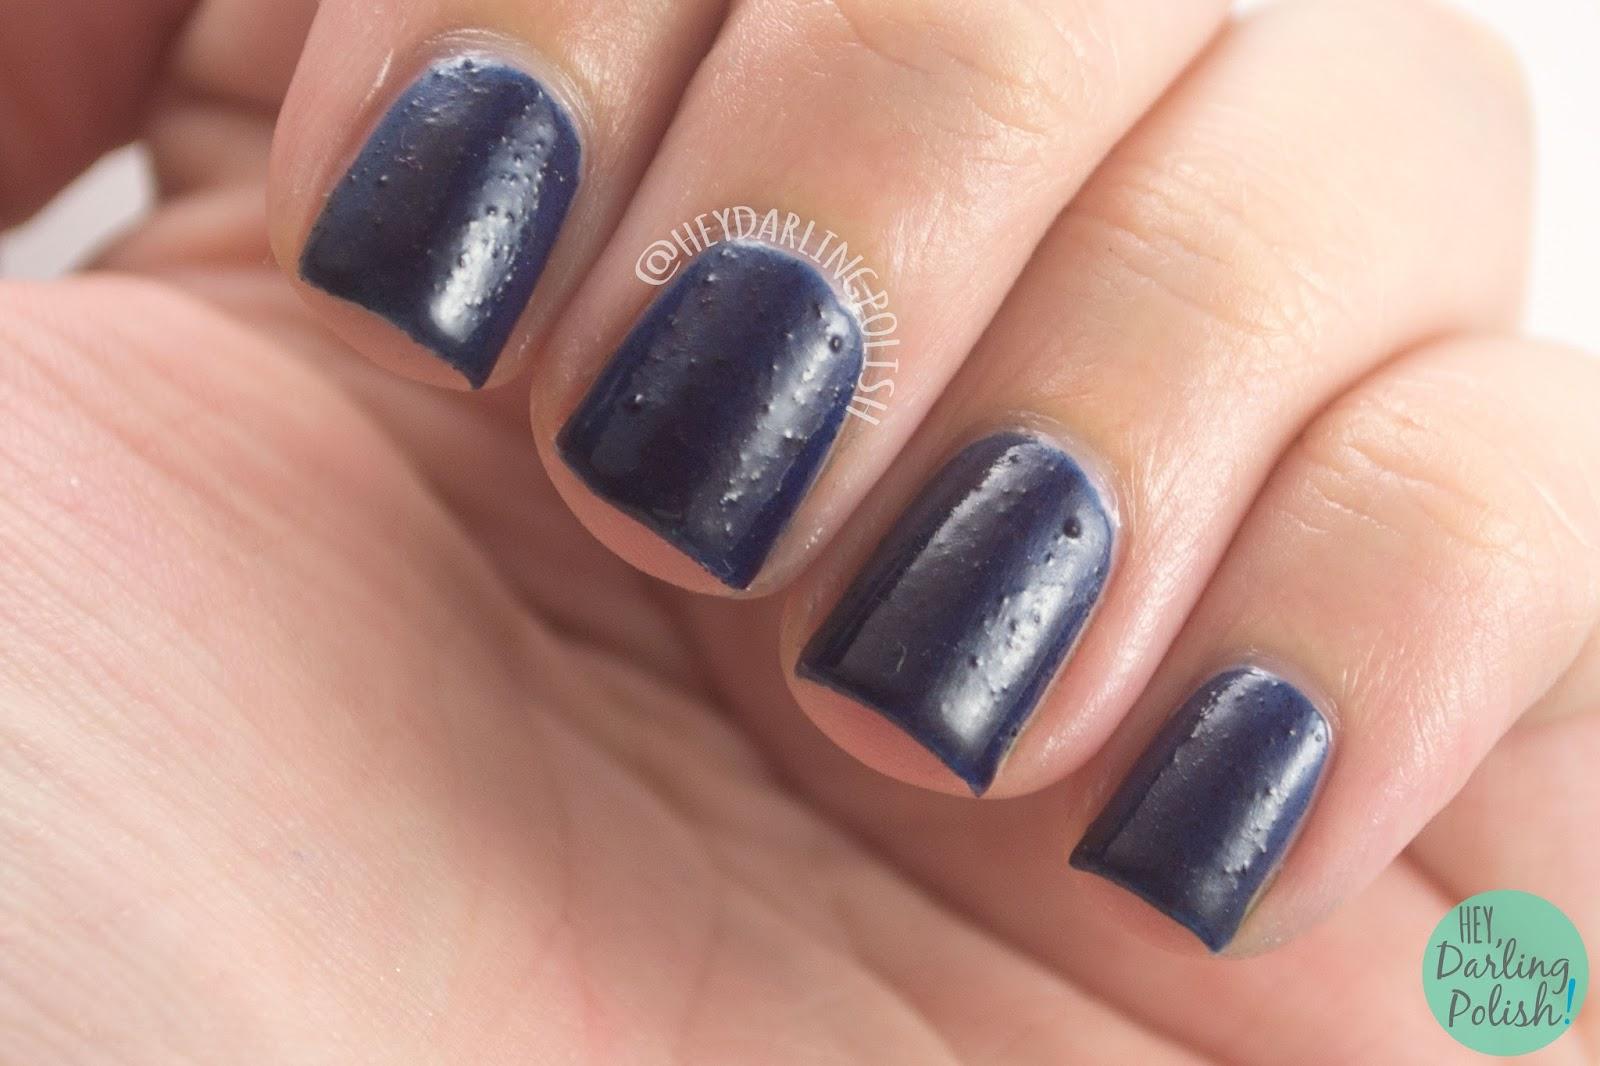 turbulent space, blue, navy, nails, nail polish, indie polish, yume lacquer, hey darling polish, sailor moon, swatches, review